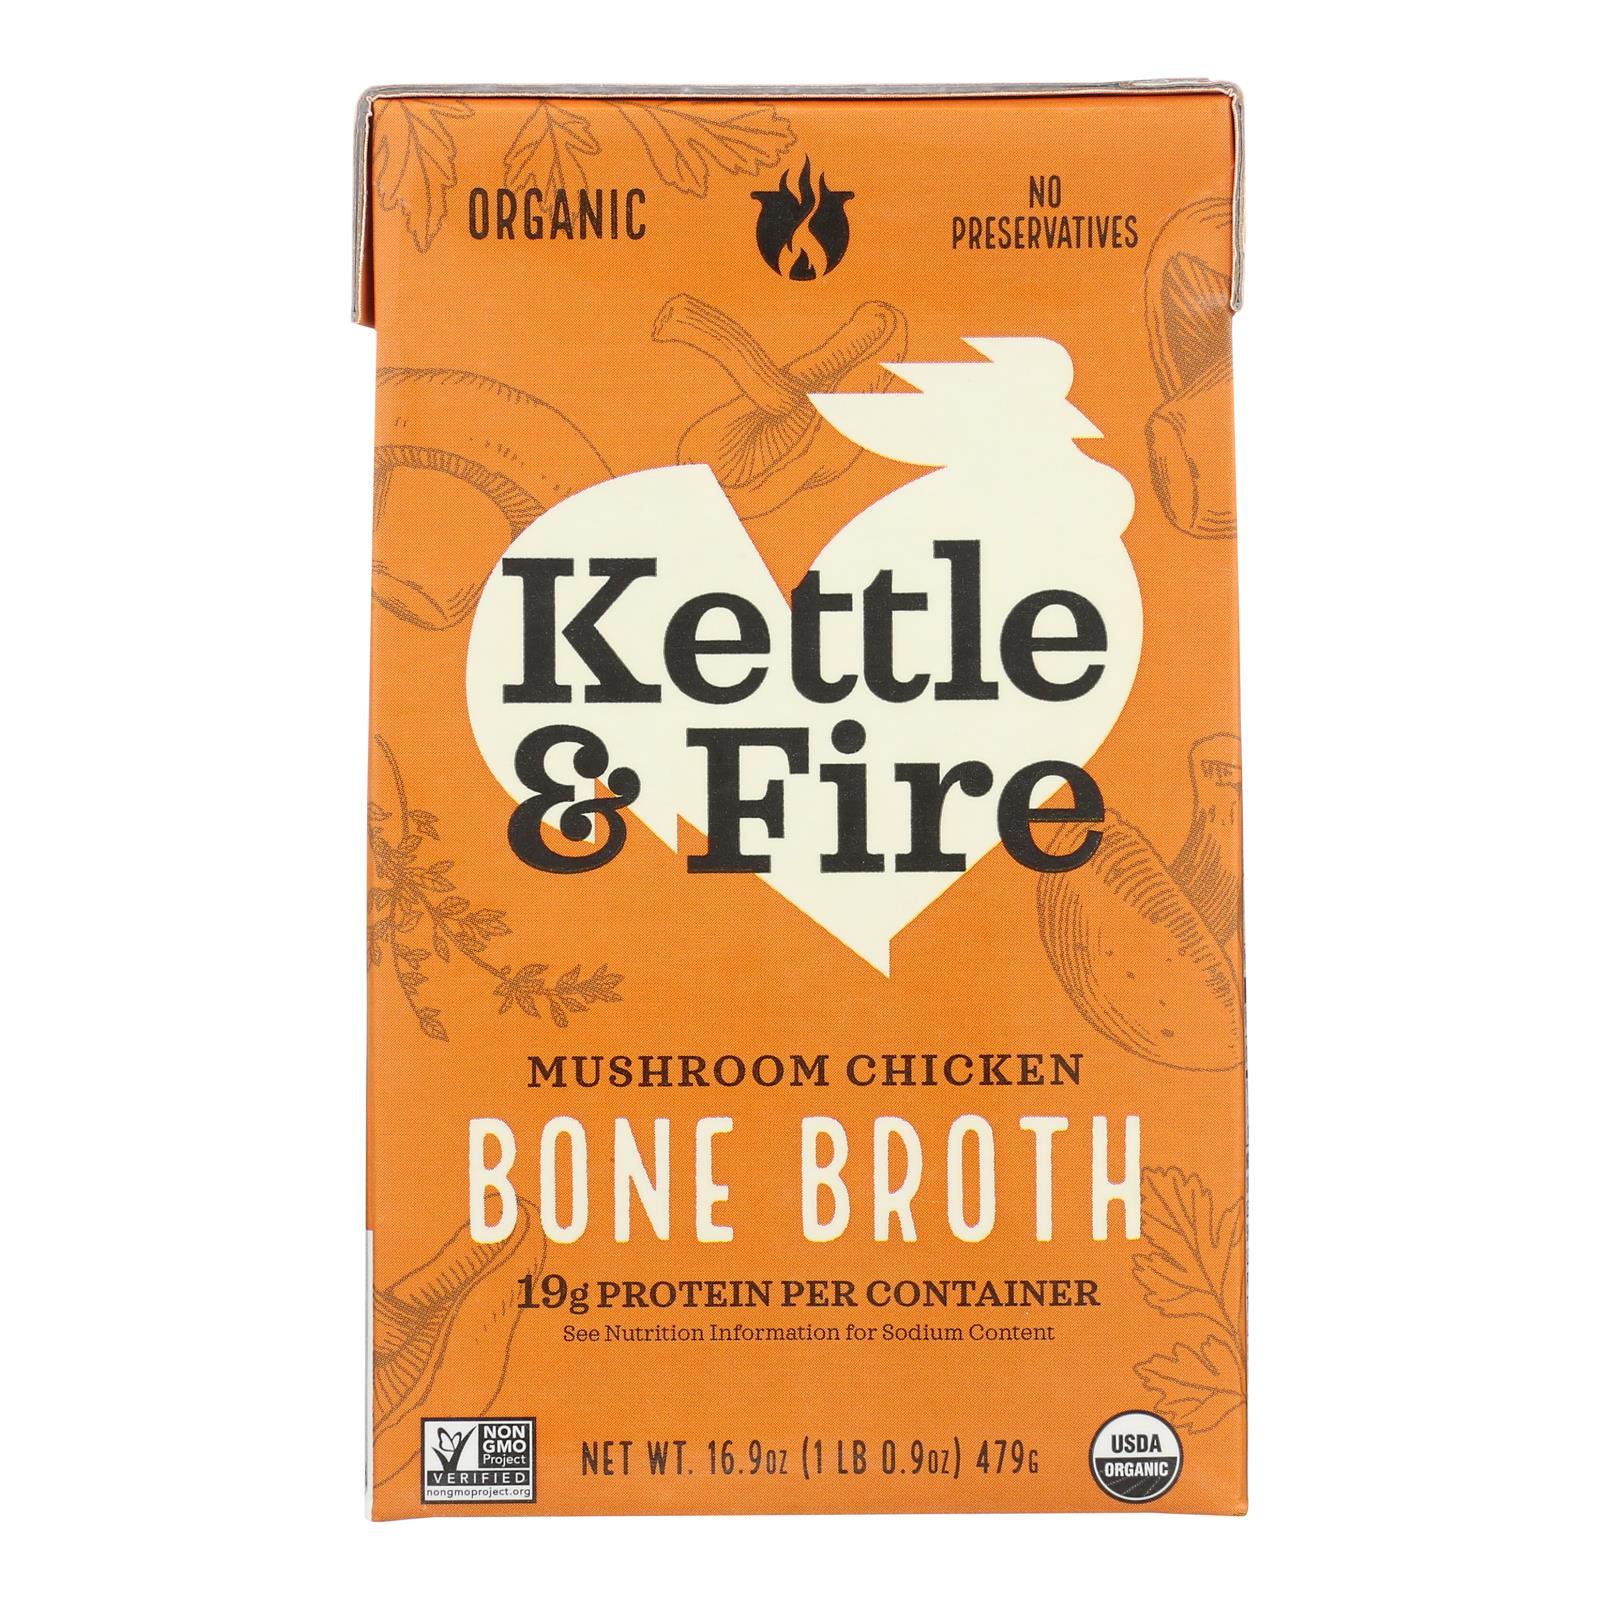 Kettle & Fire Mushroom Chicken Bone Broth  - Case of 6 - 16.9 OZ